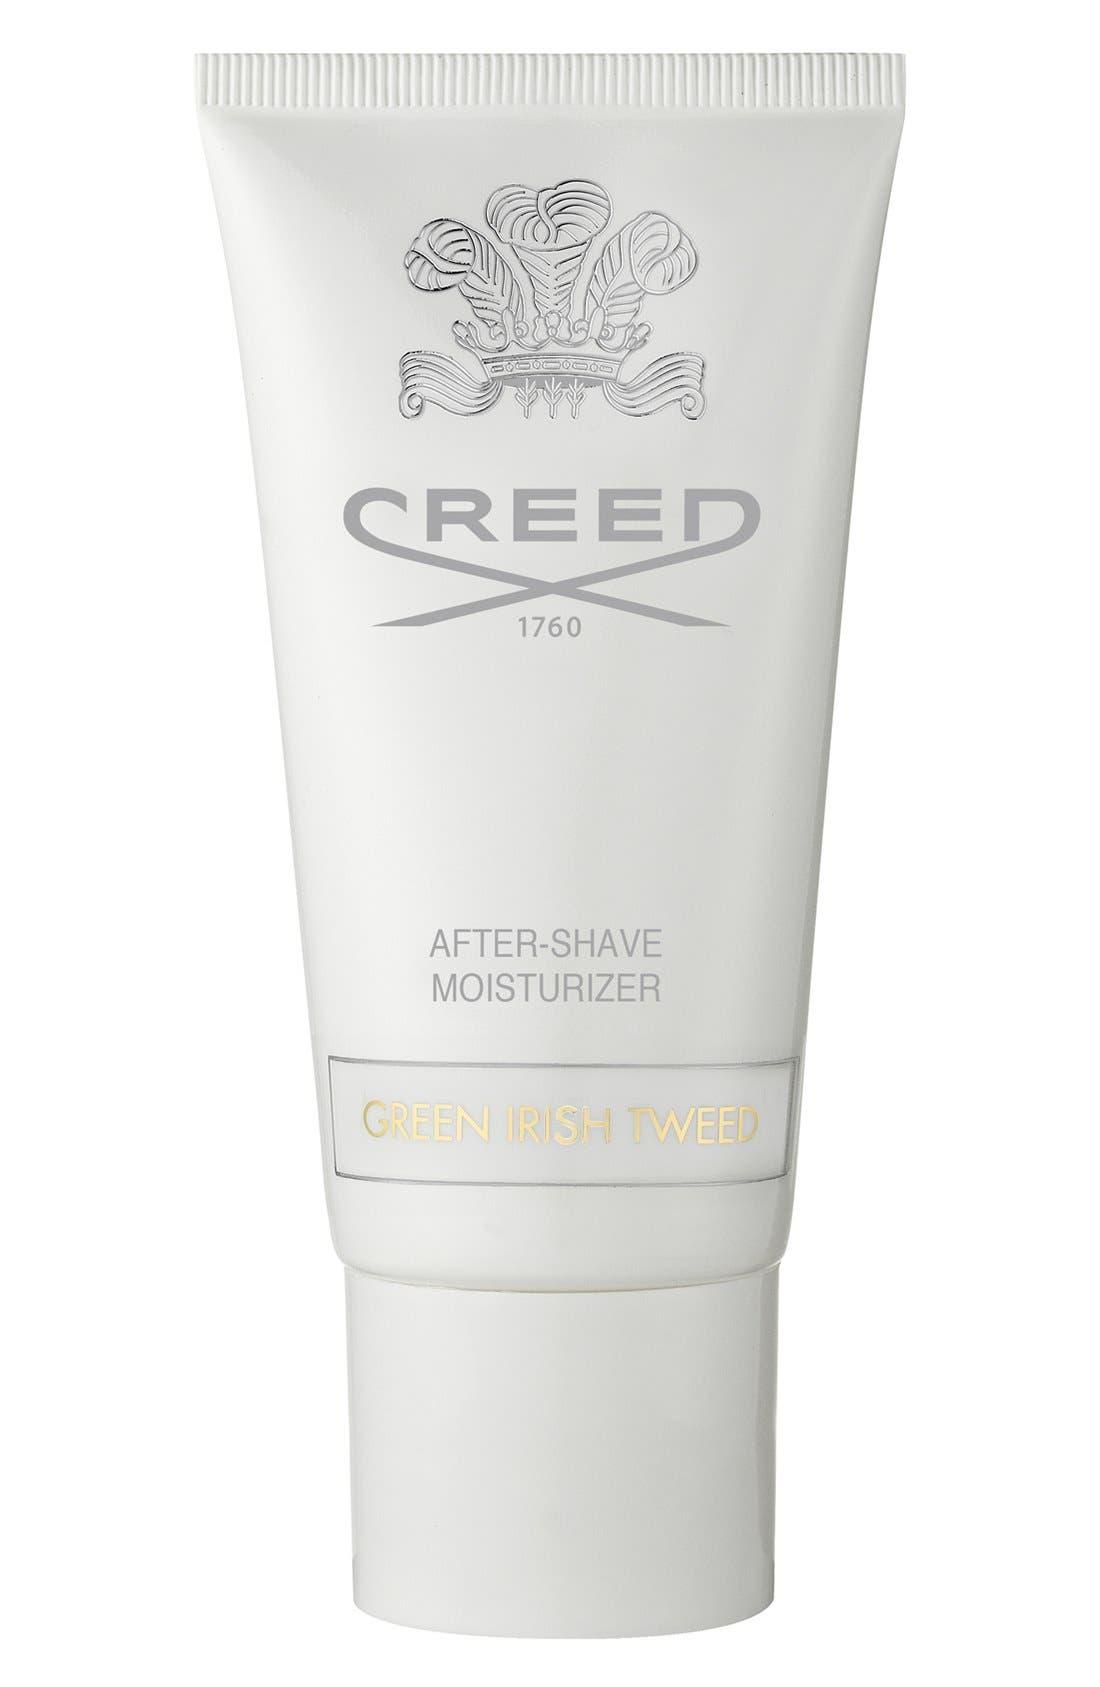 Creed 'Green Irish Tweed' After-Shave Balm